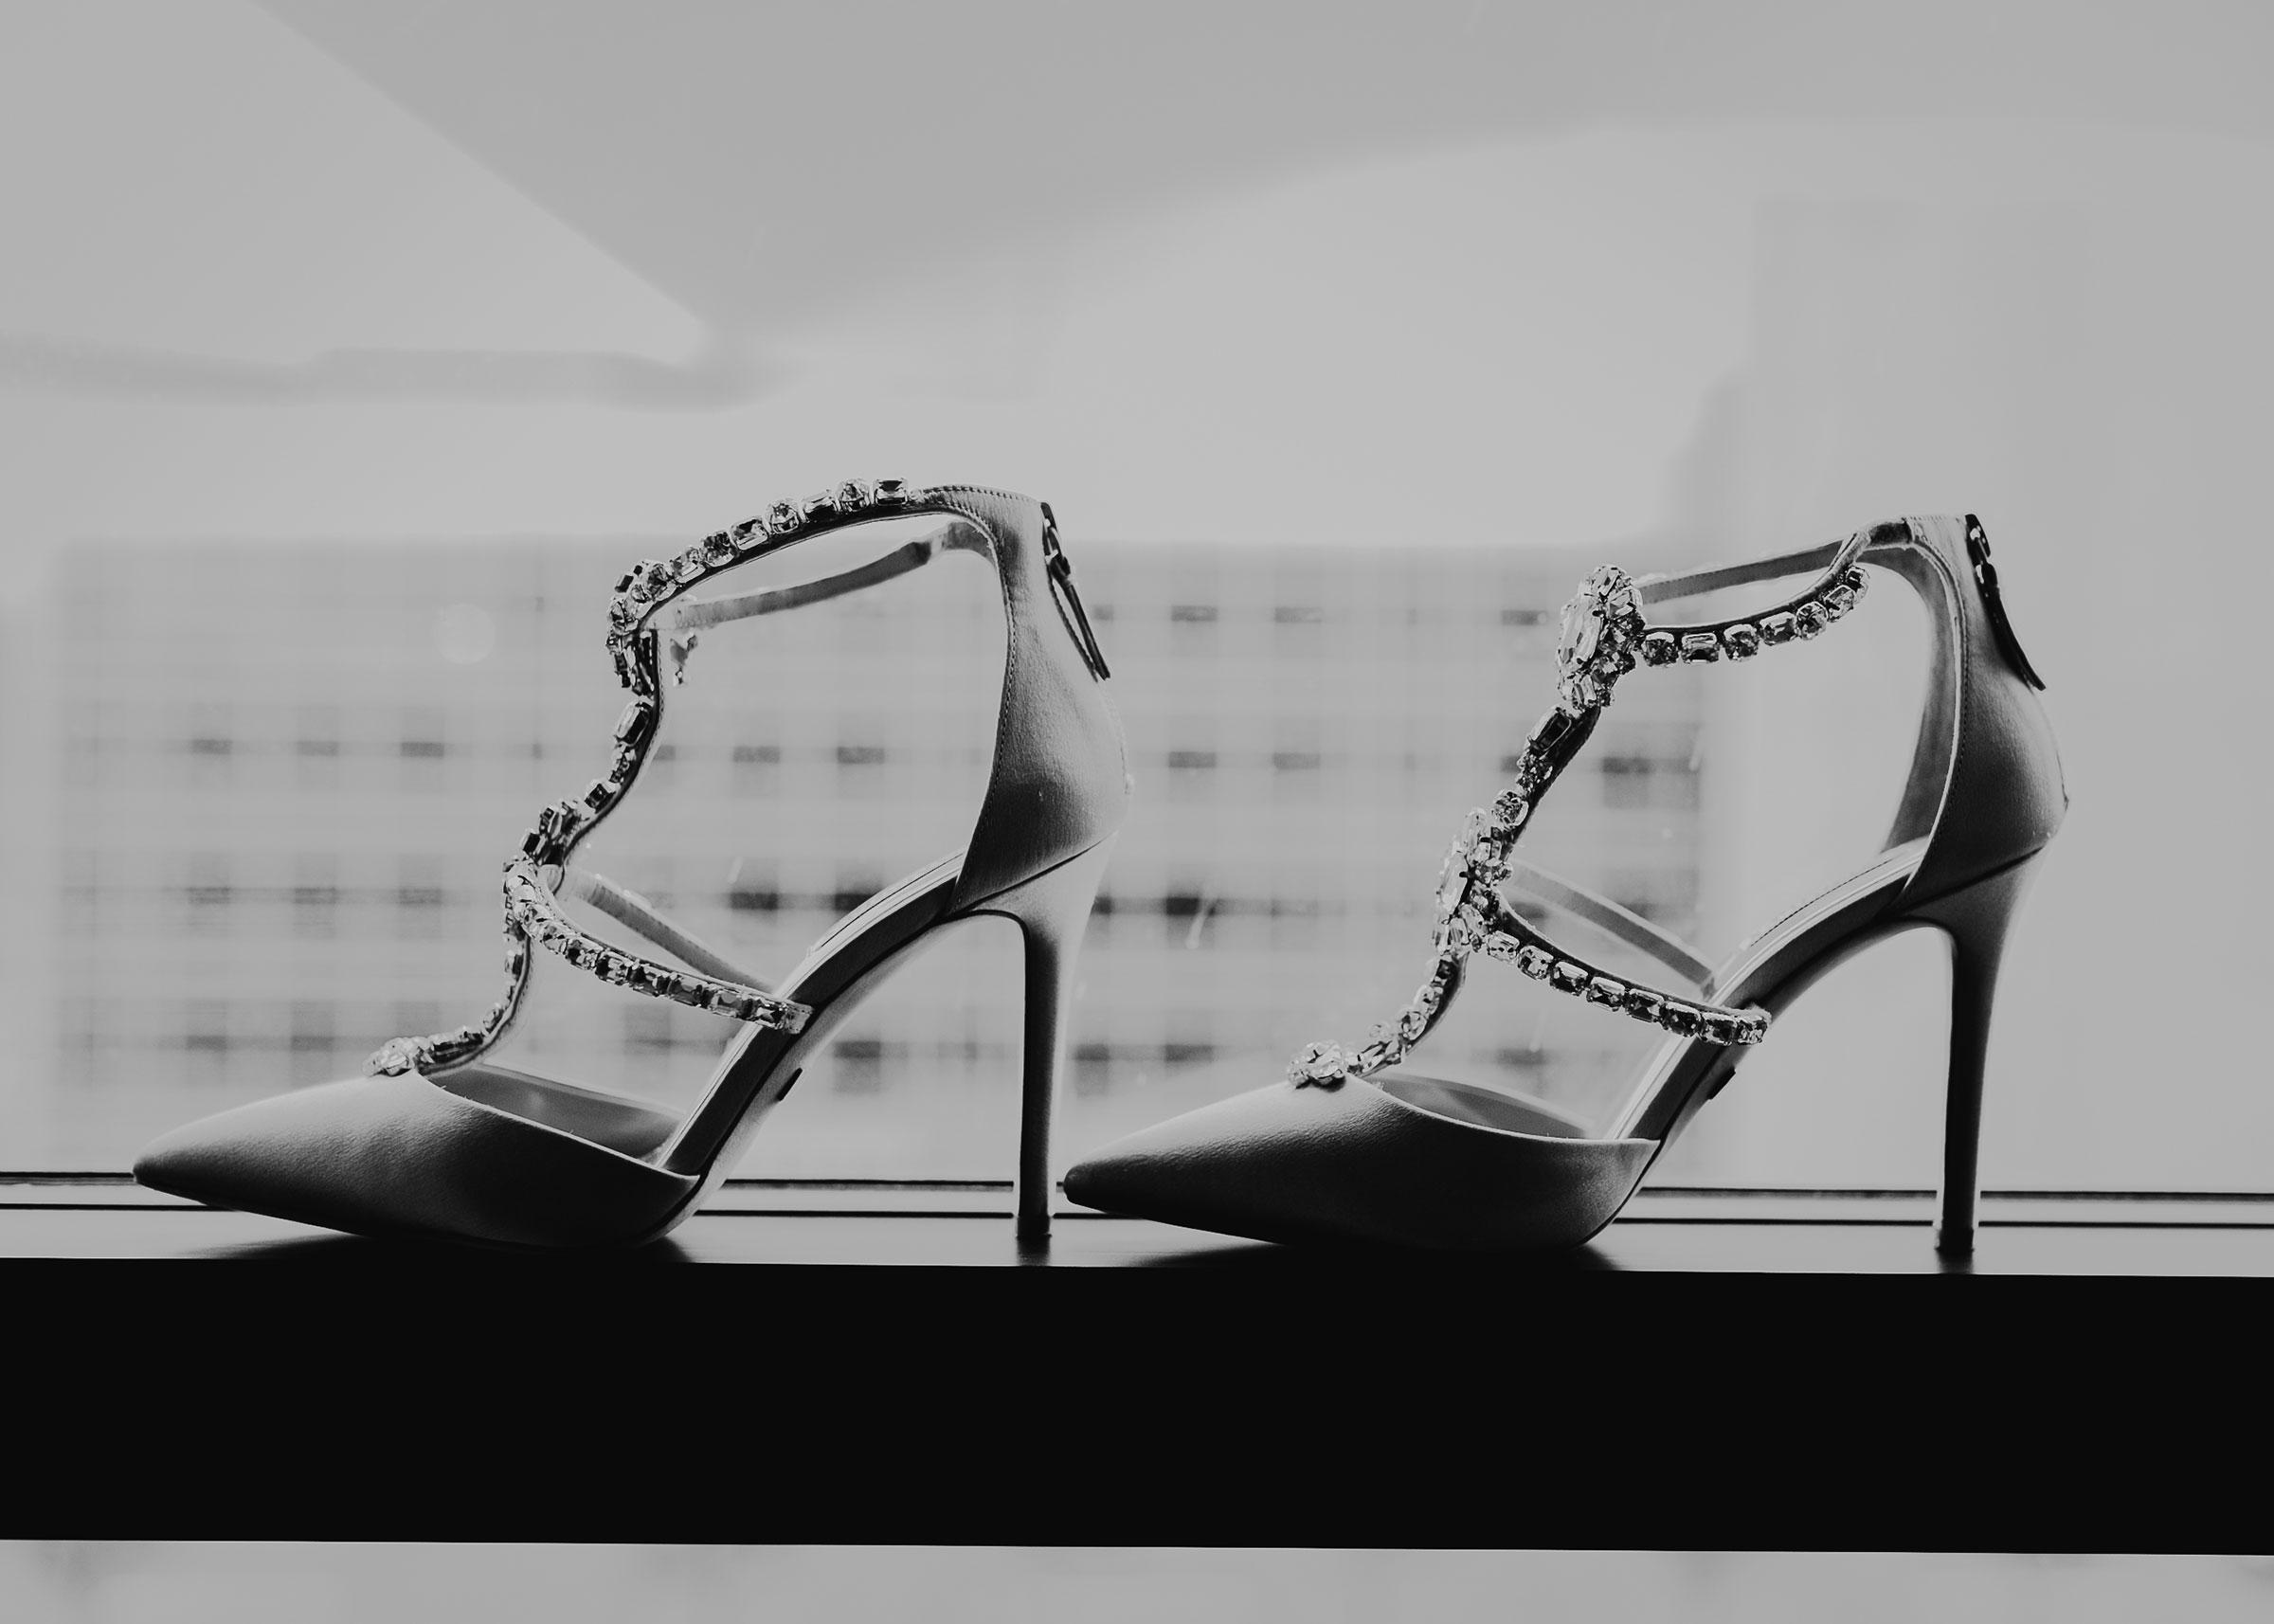 bride-shoes-in-window-hilton-omaha-nebraska-raelyn-ramey-photography.jpg